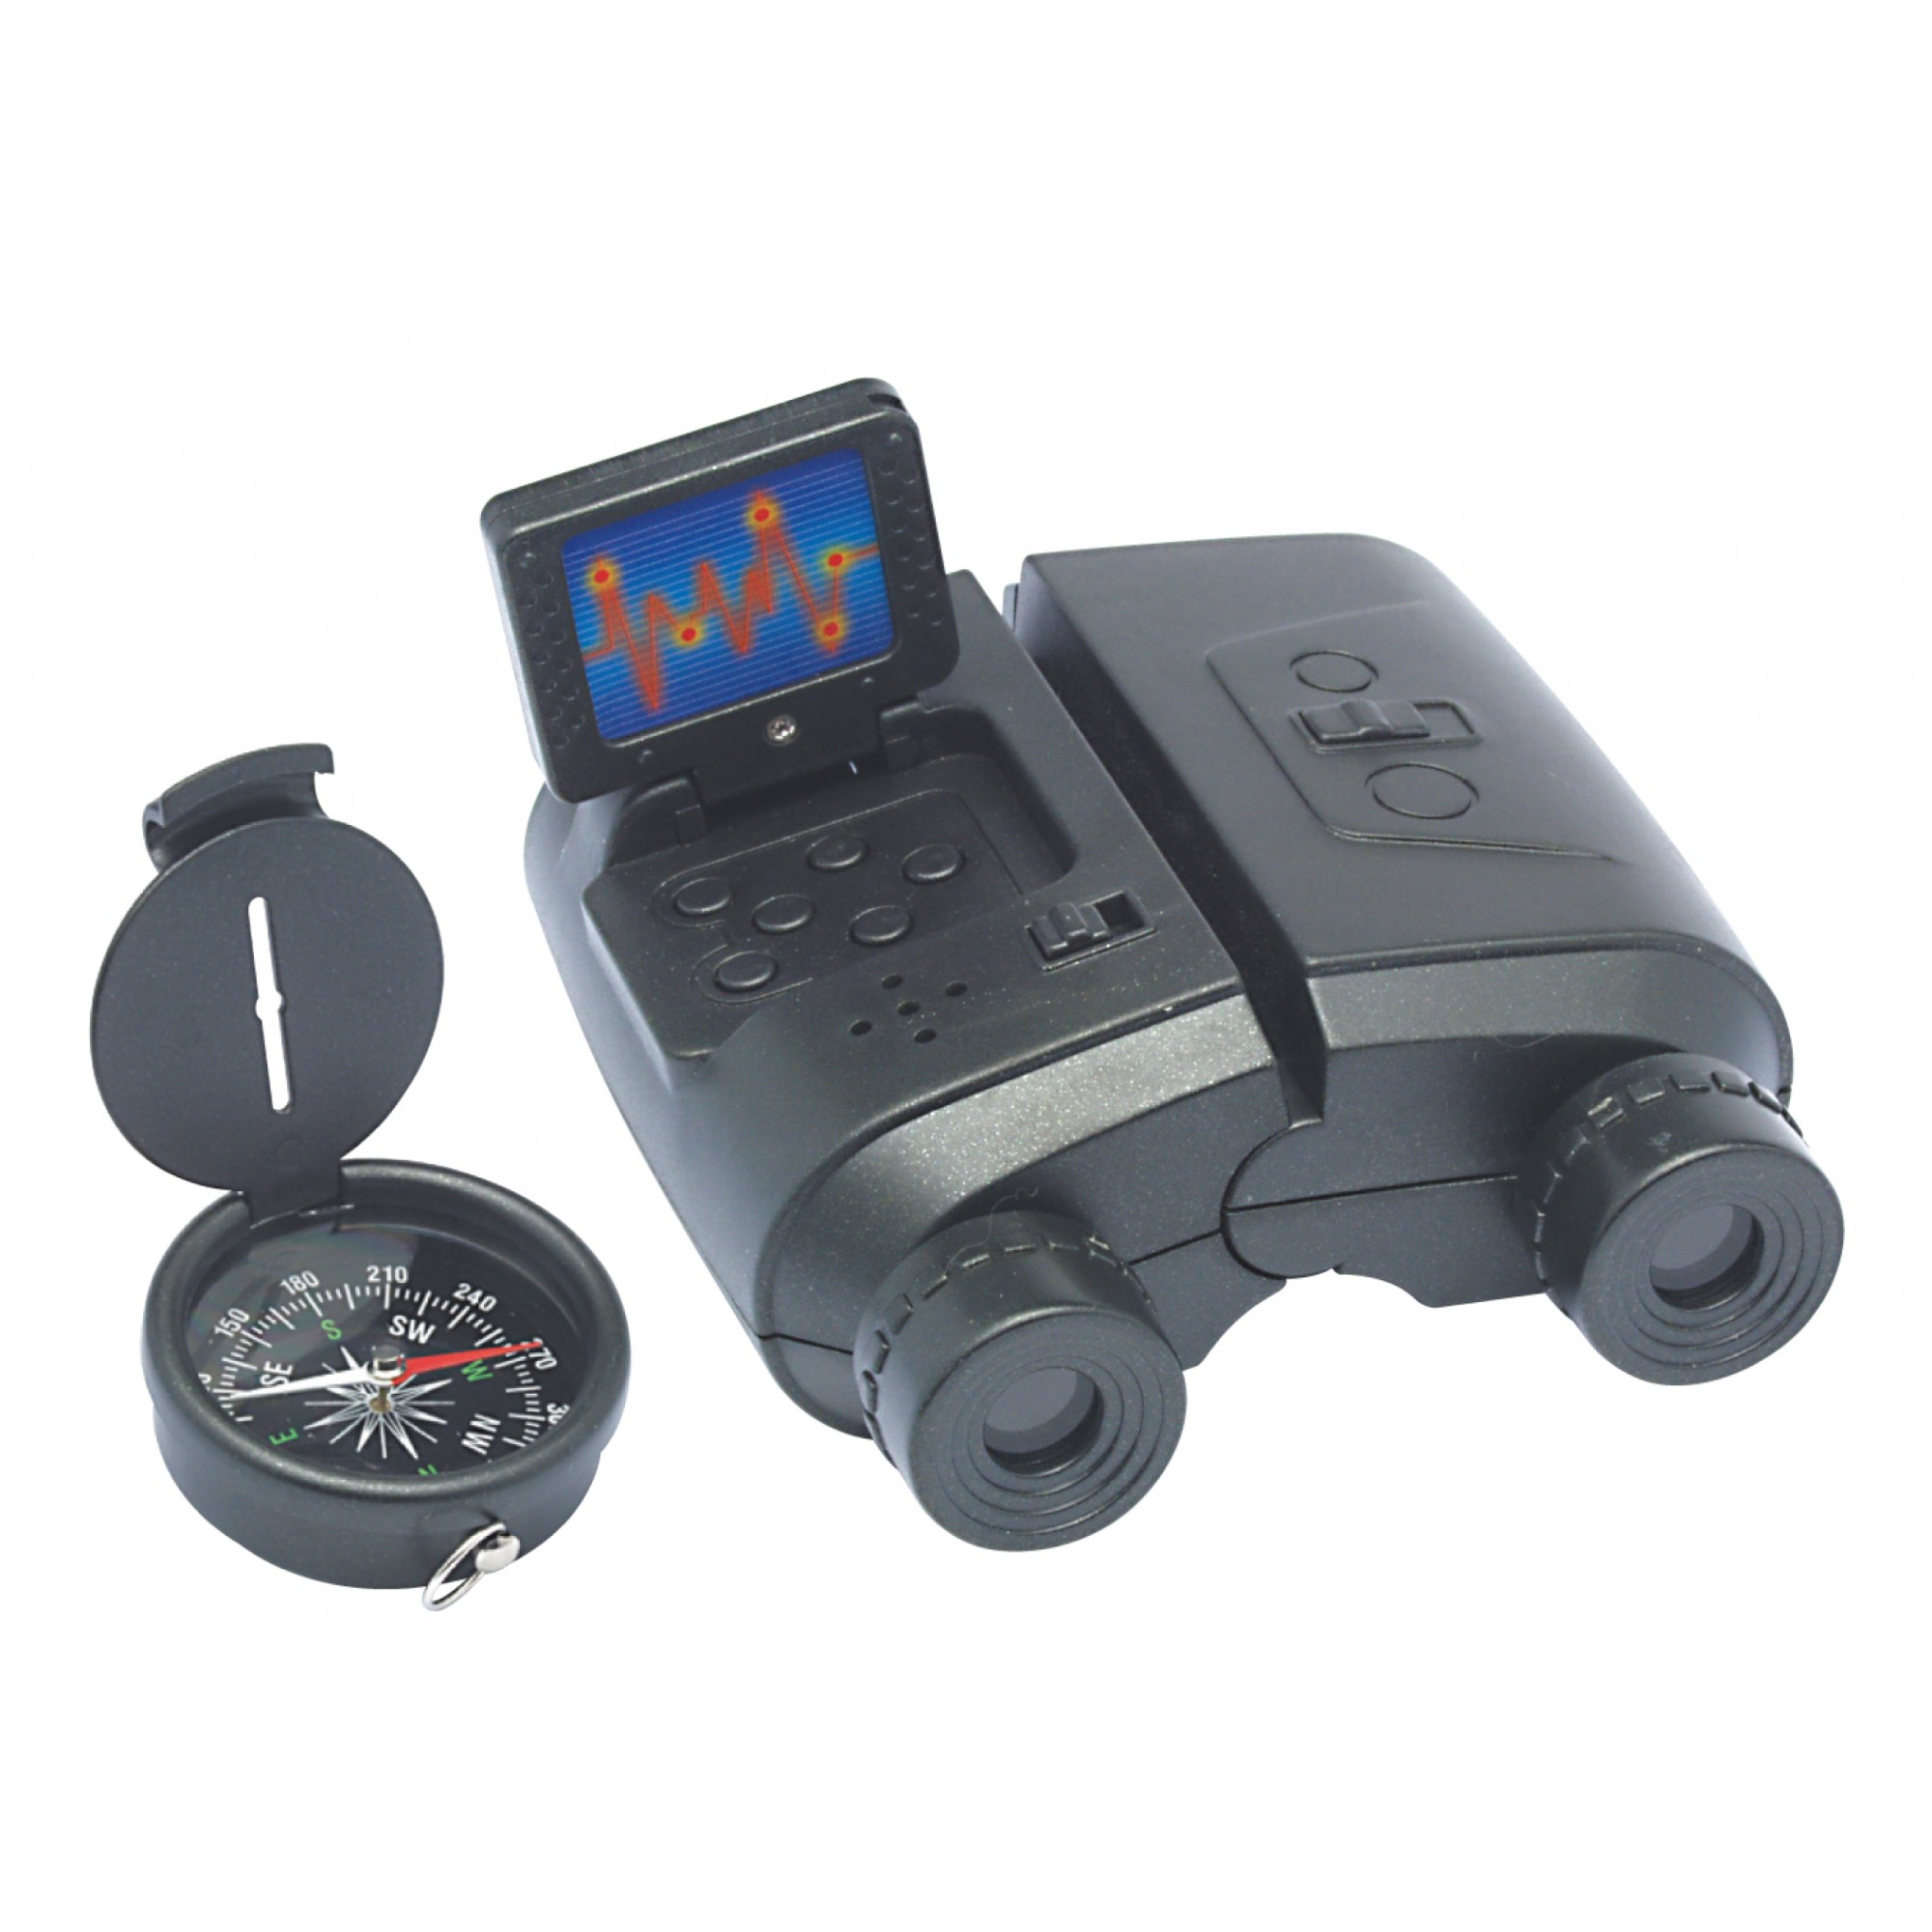 Binocular & Compass